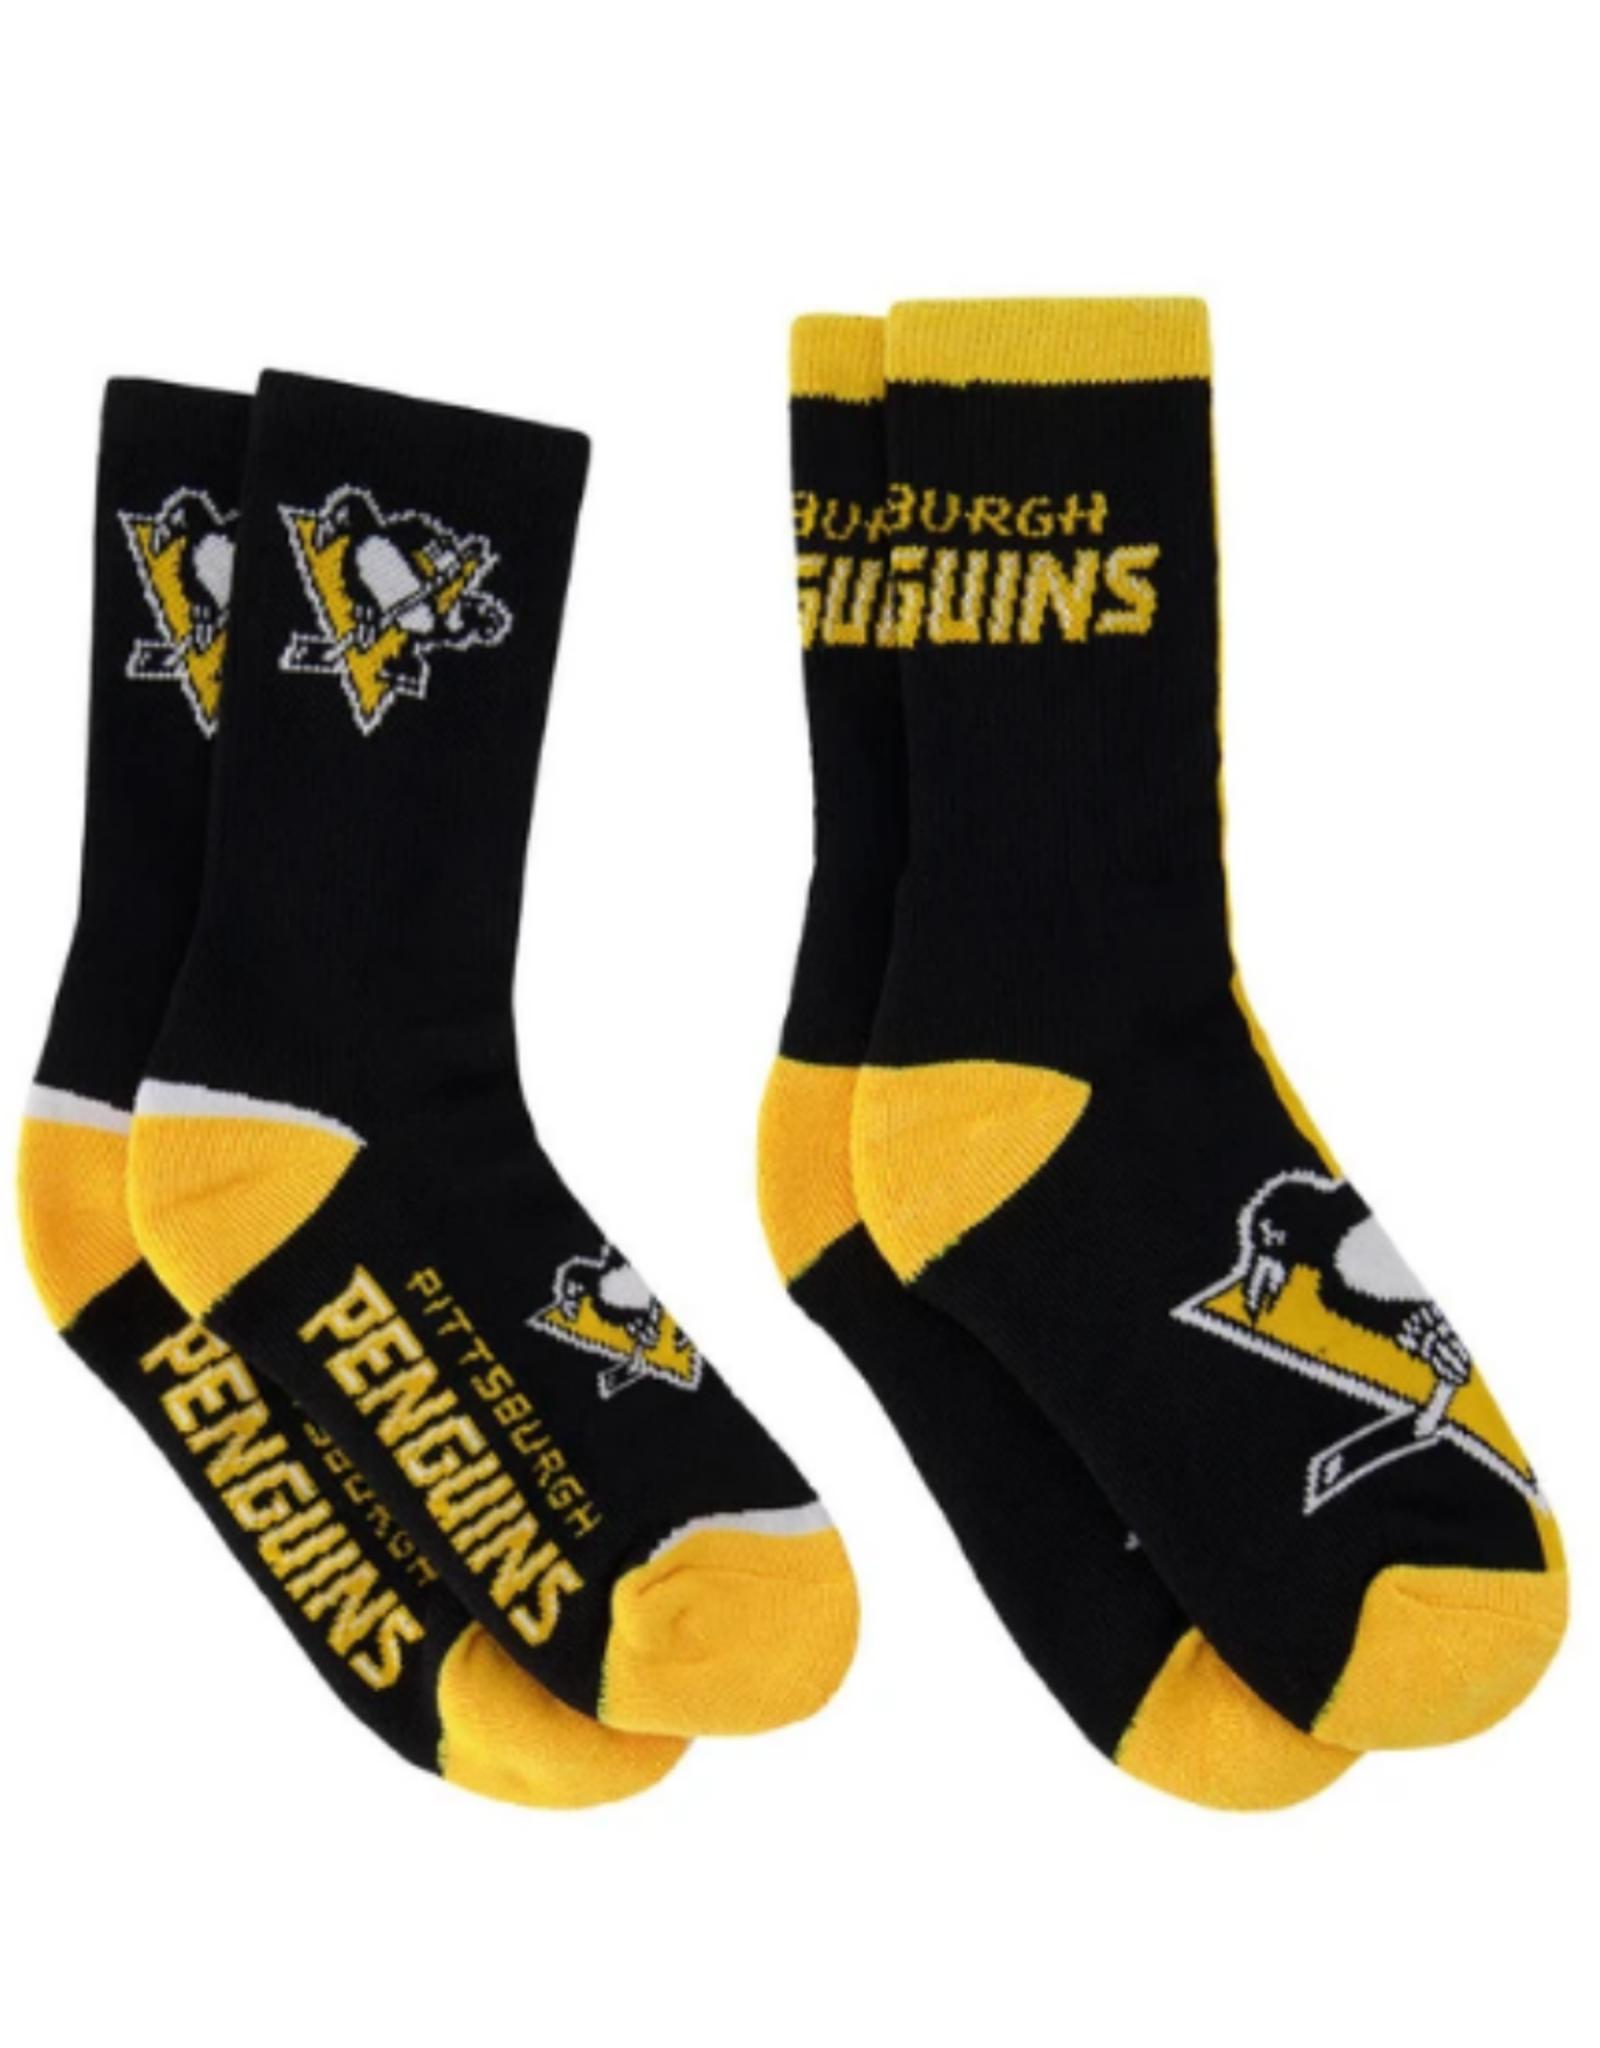 FBF Adult Socks 2 Pack Pittsburgh Penguins L